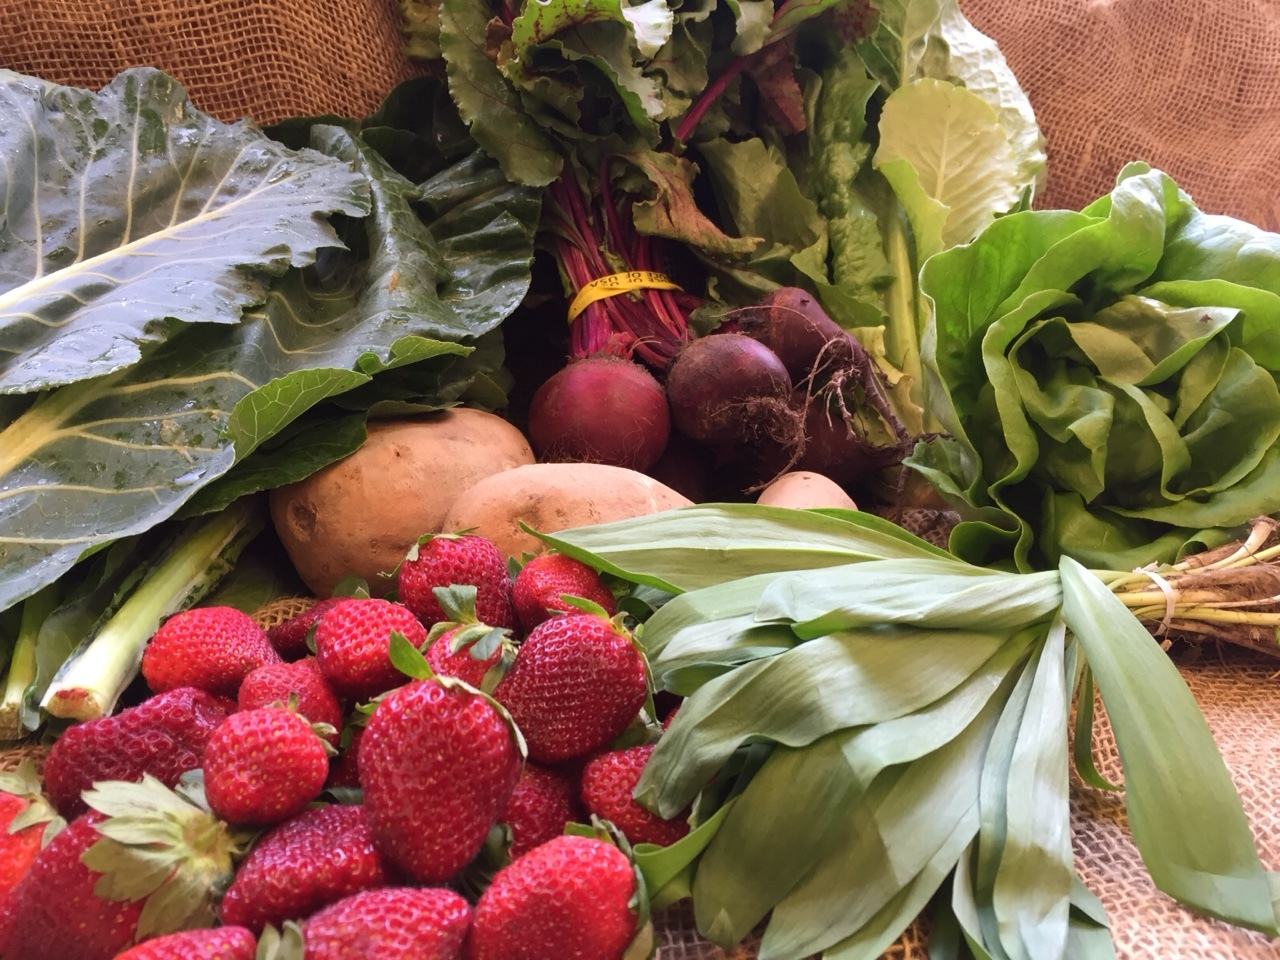 Hydroponic lettuce, ramps, strawberries, collard green, romaine, beets, cremini mushroom, white sweet potato